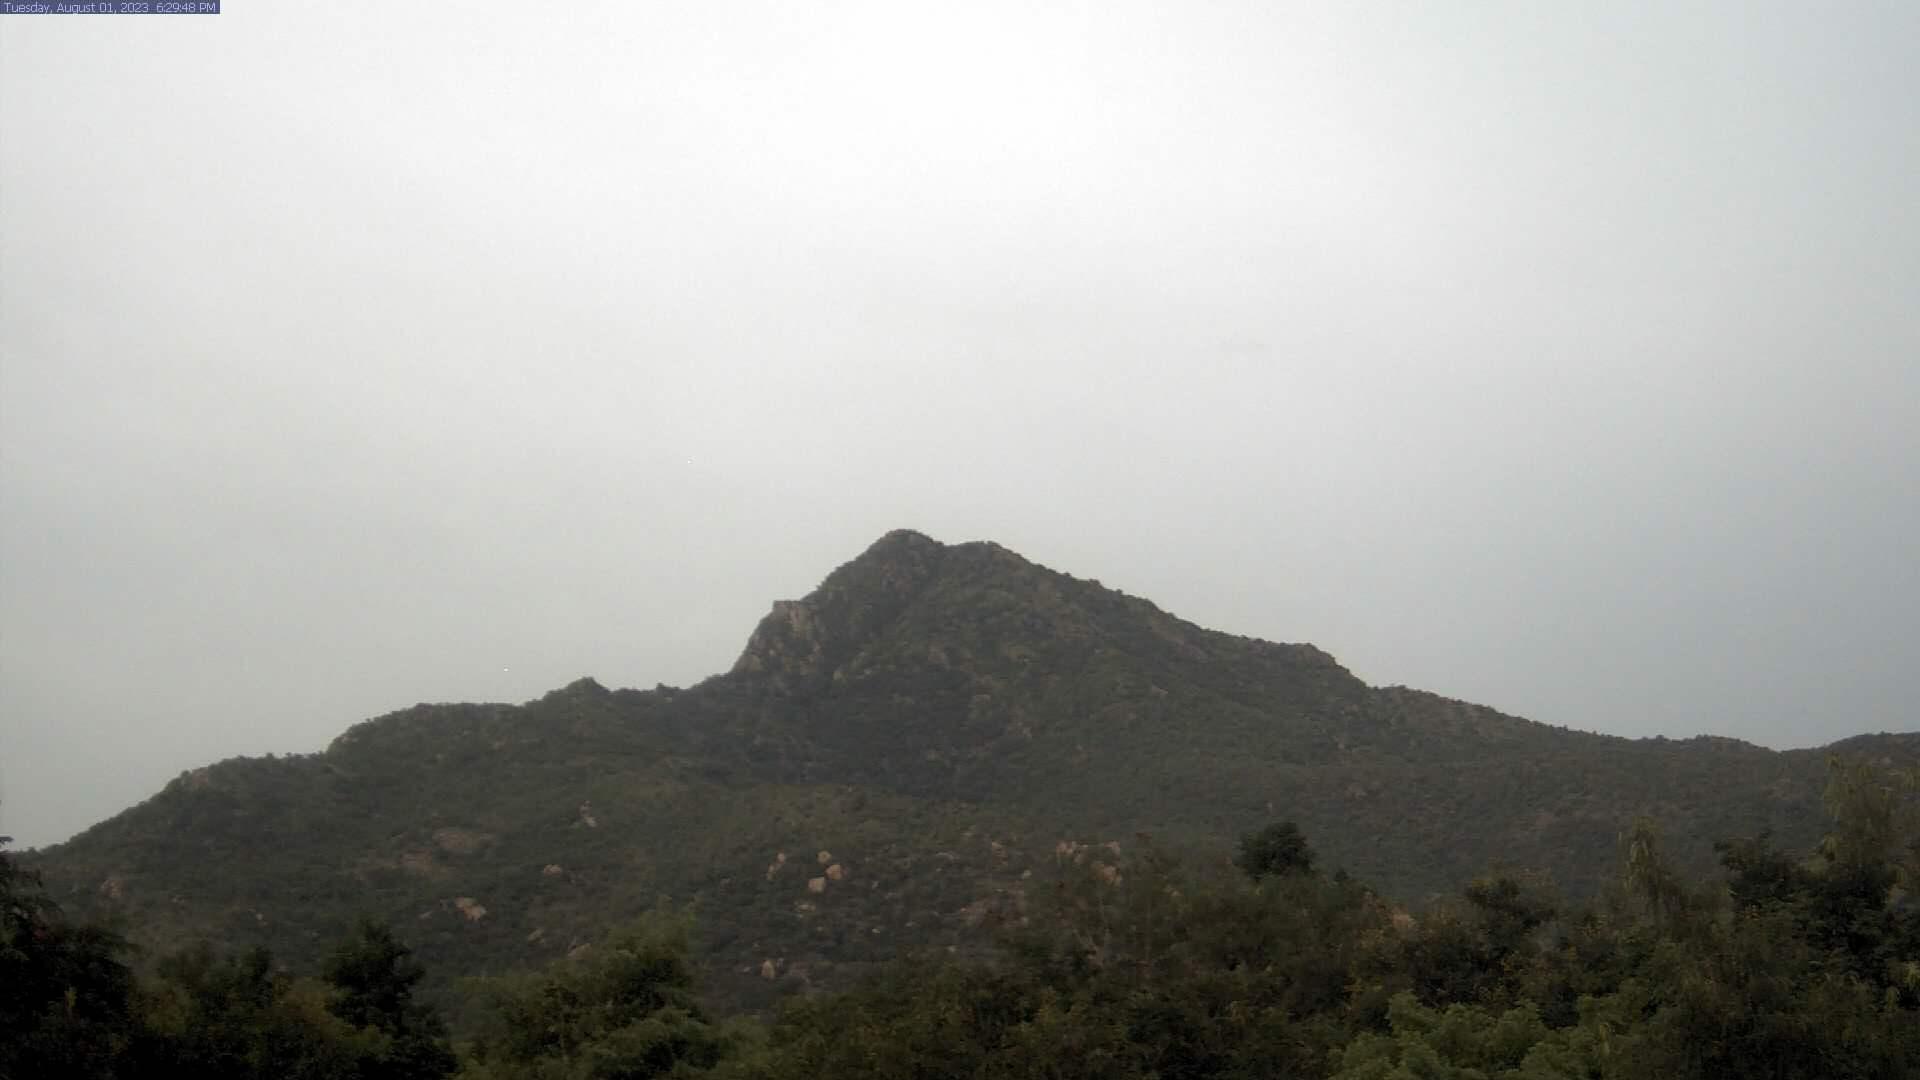 Tiruvannamalai Live Cam, India – Arunachala Mountain